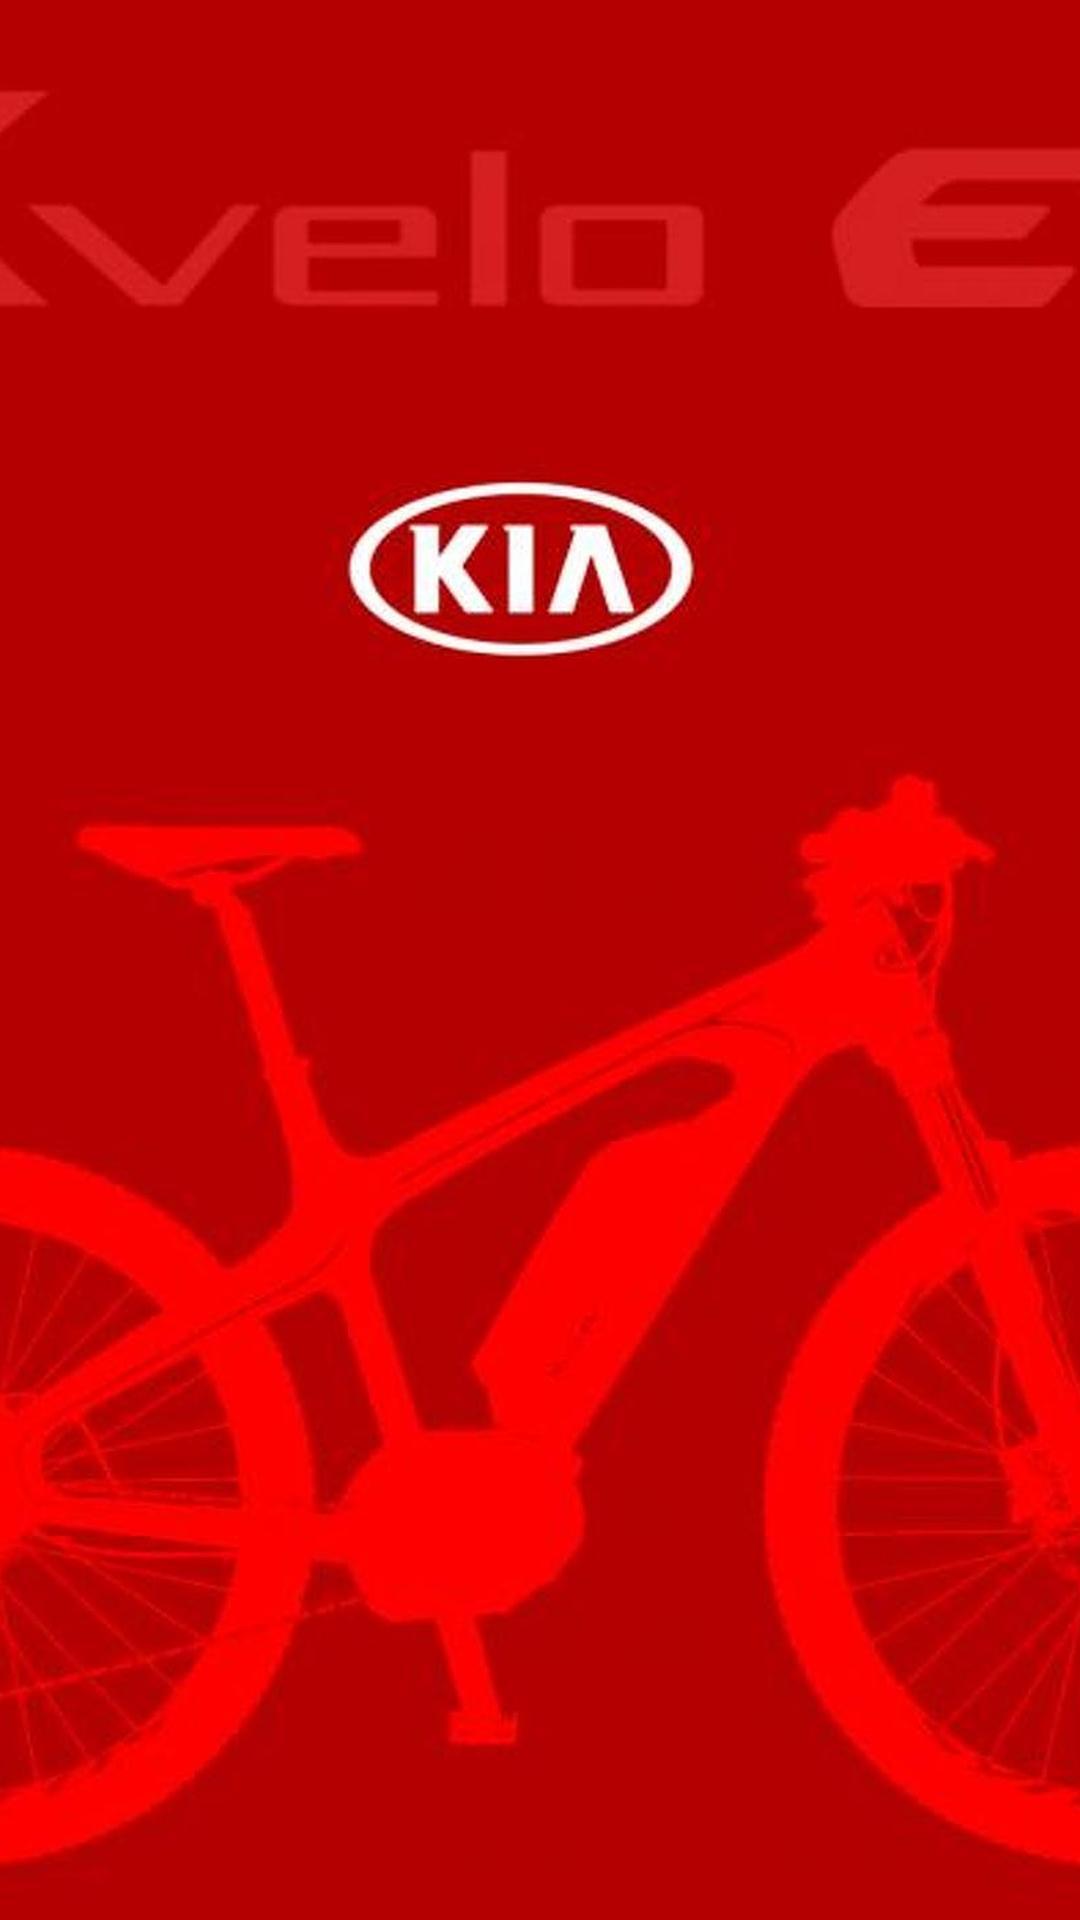 Kia teases K-velo electric bike ahead of Geneva reveal